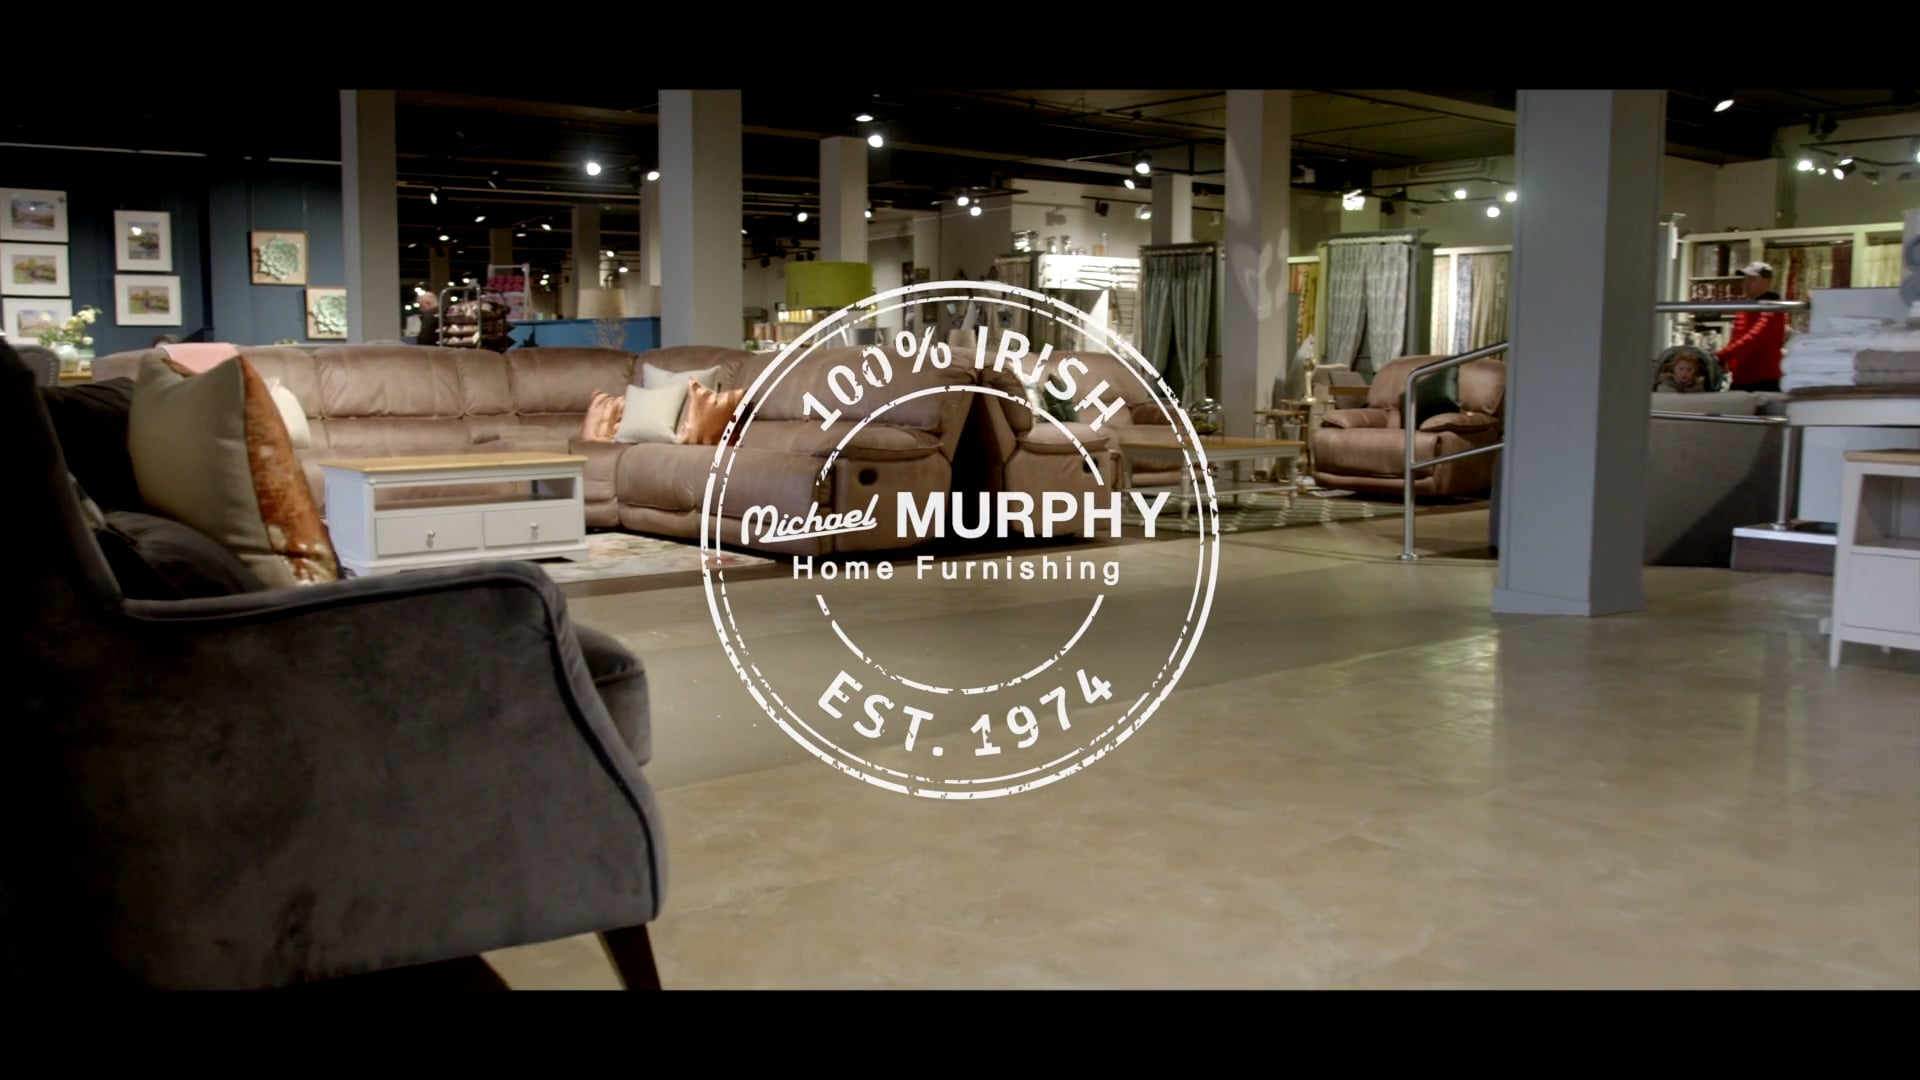 Michael Murphy Home Furnishings - 45 Years